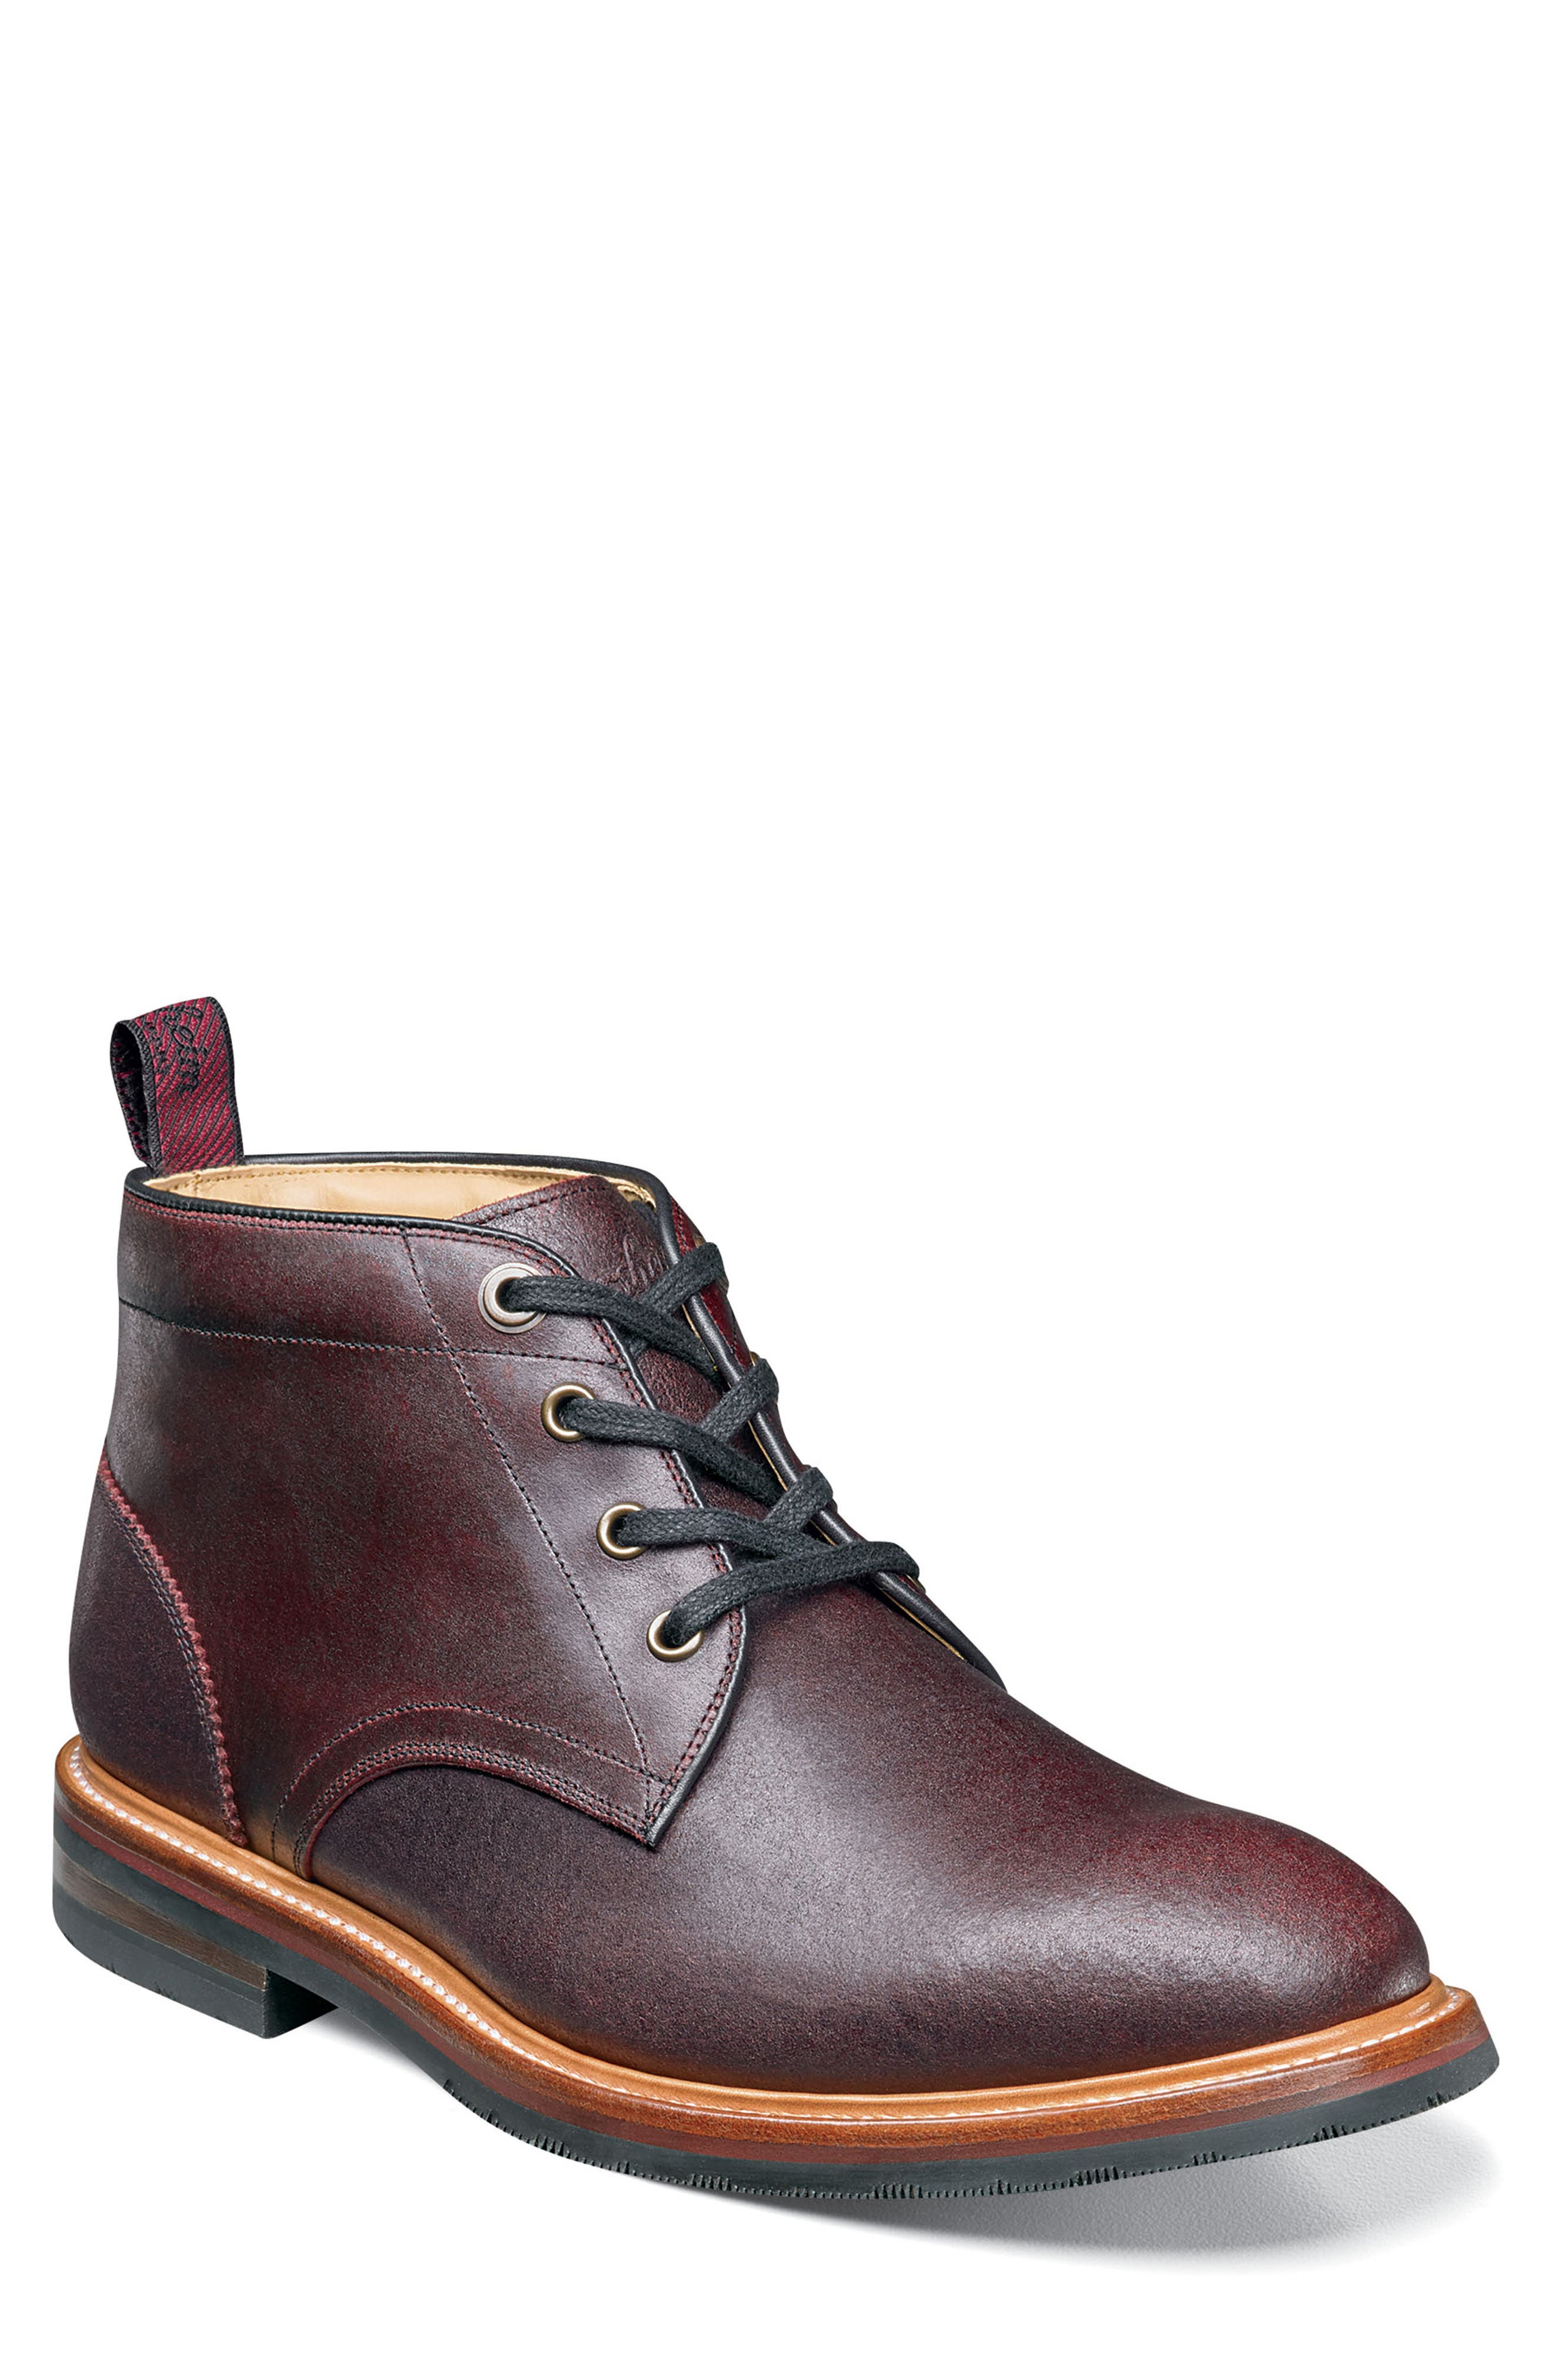 Florsheim Foundry Leather Boot, Burgundy